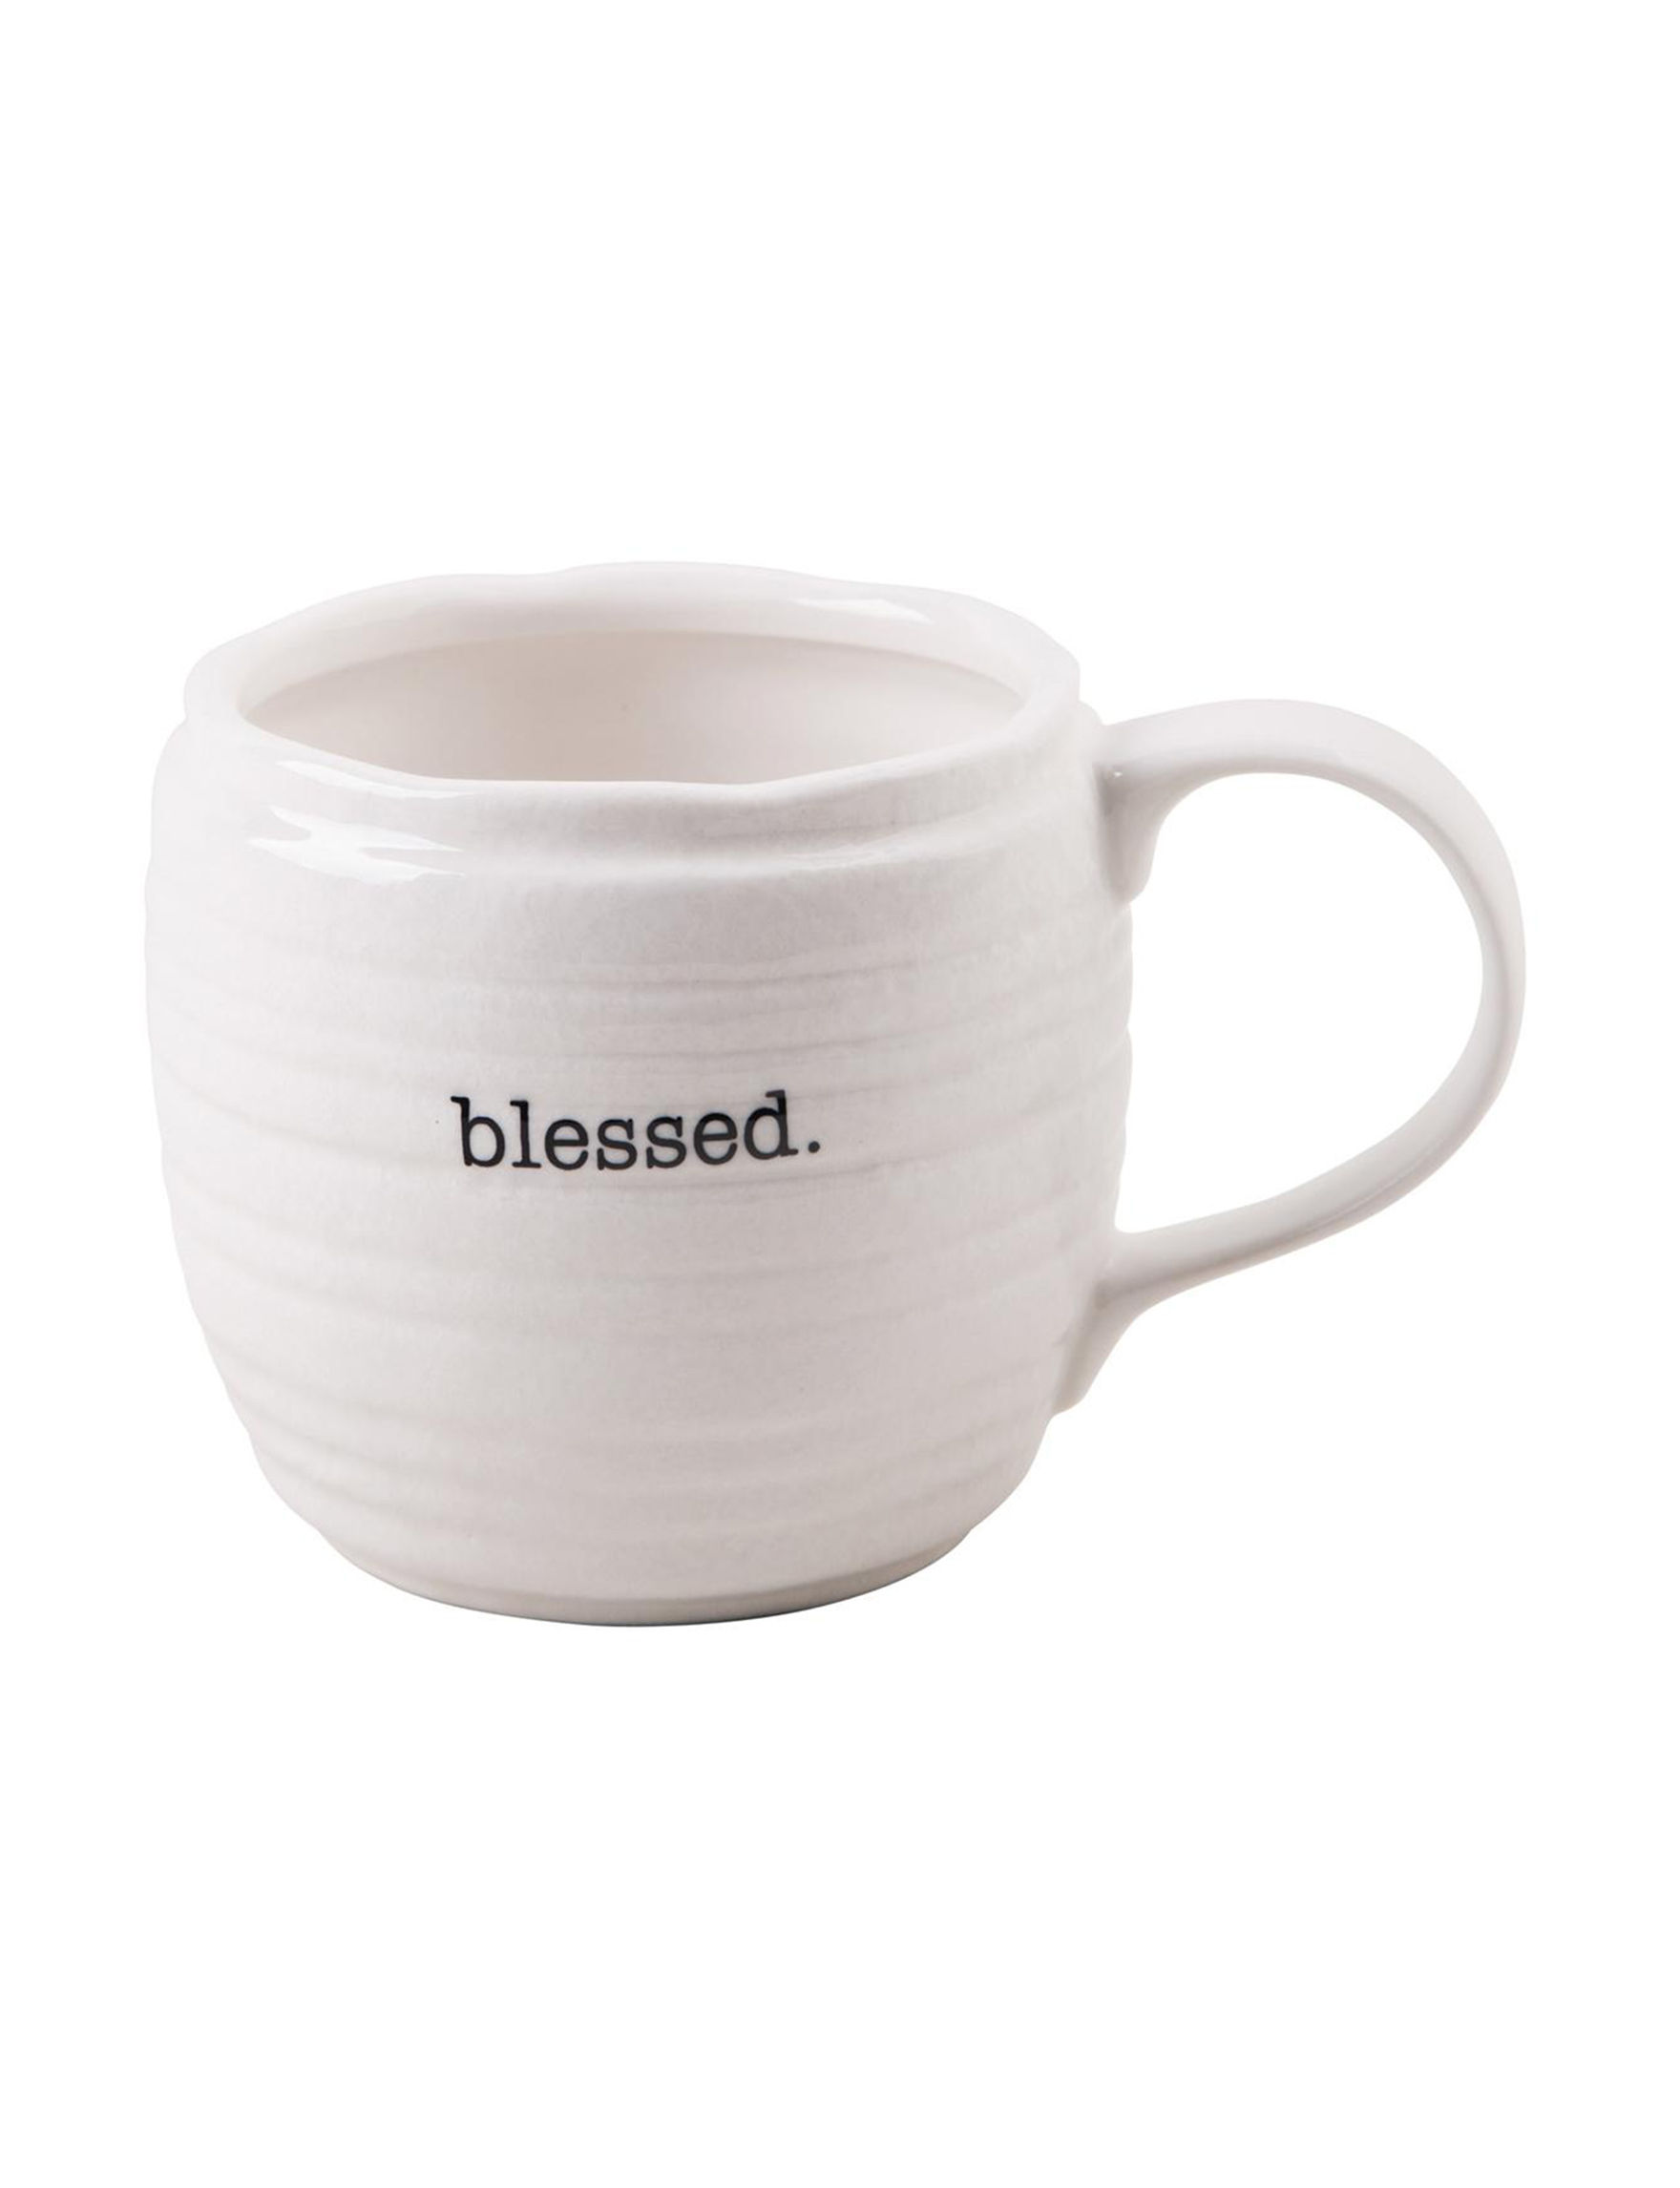 Home Essentials White Mugs Drinkware